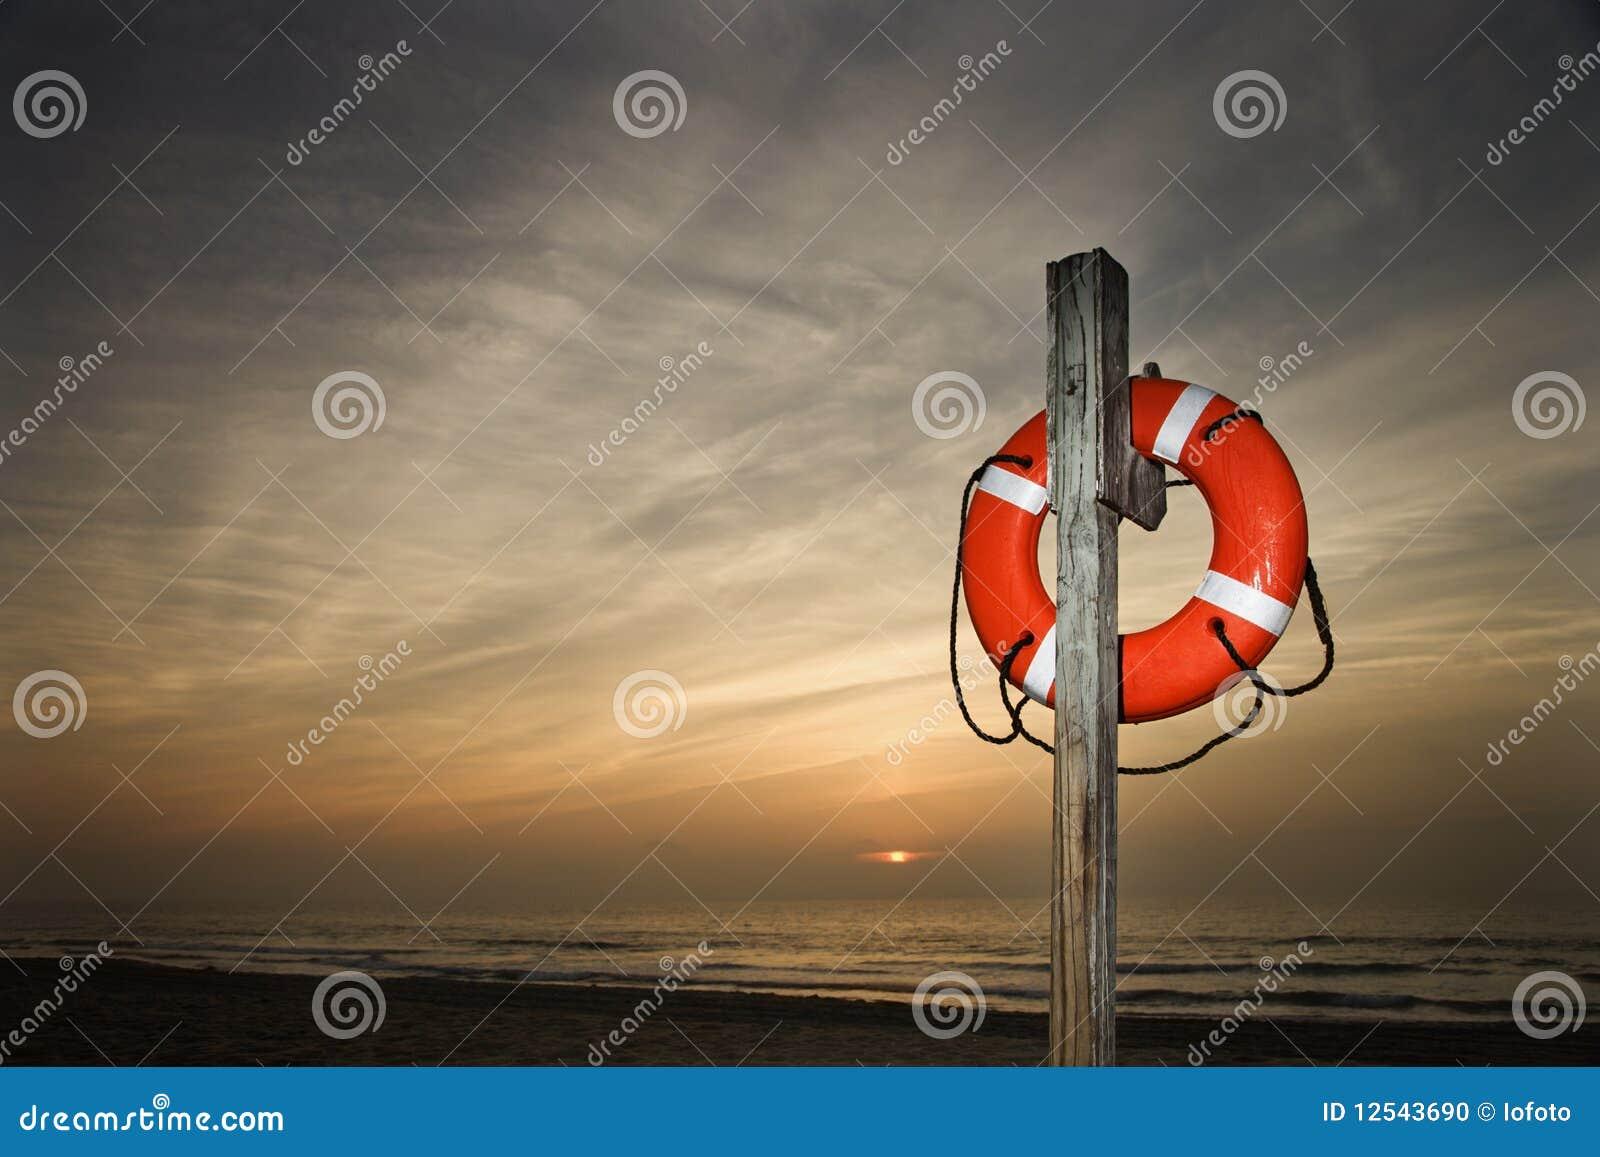 Life Saver on Beach